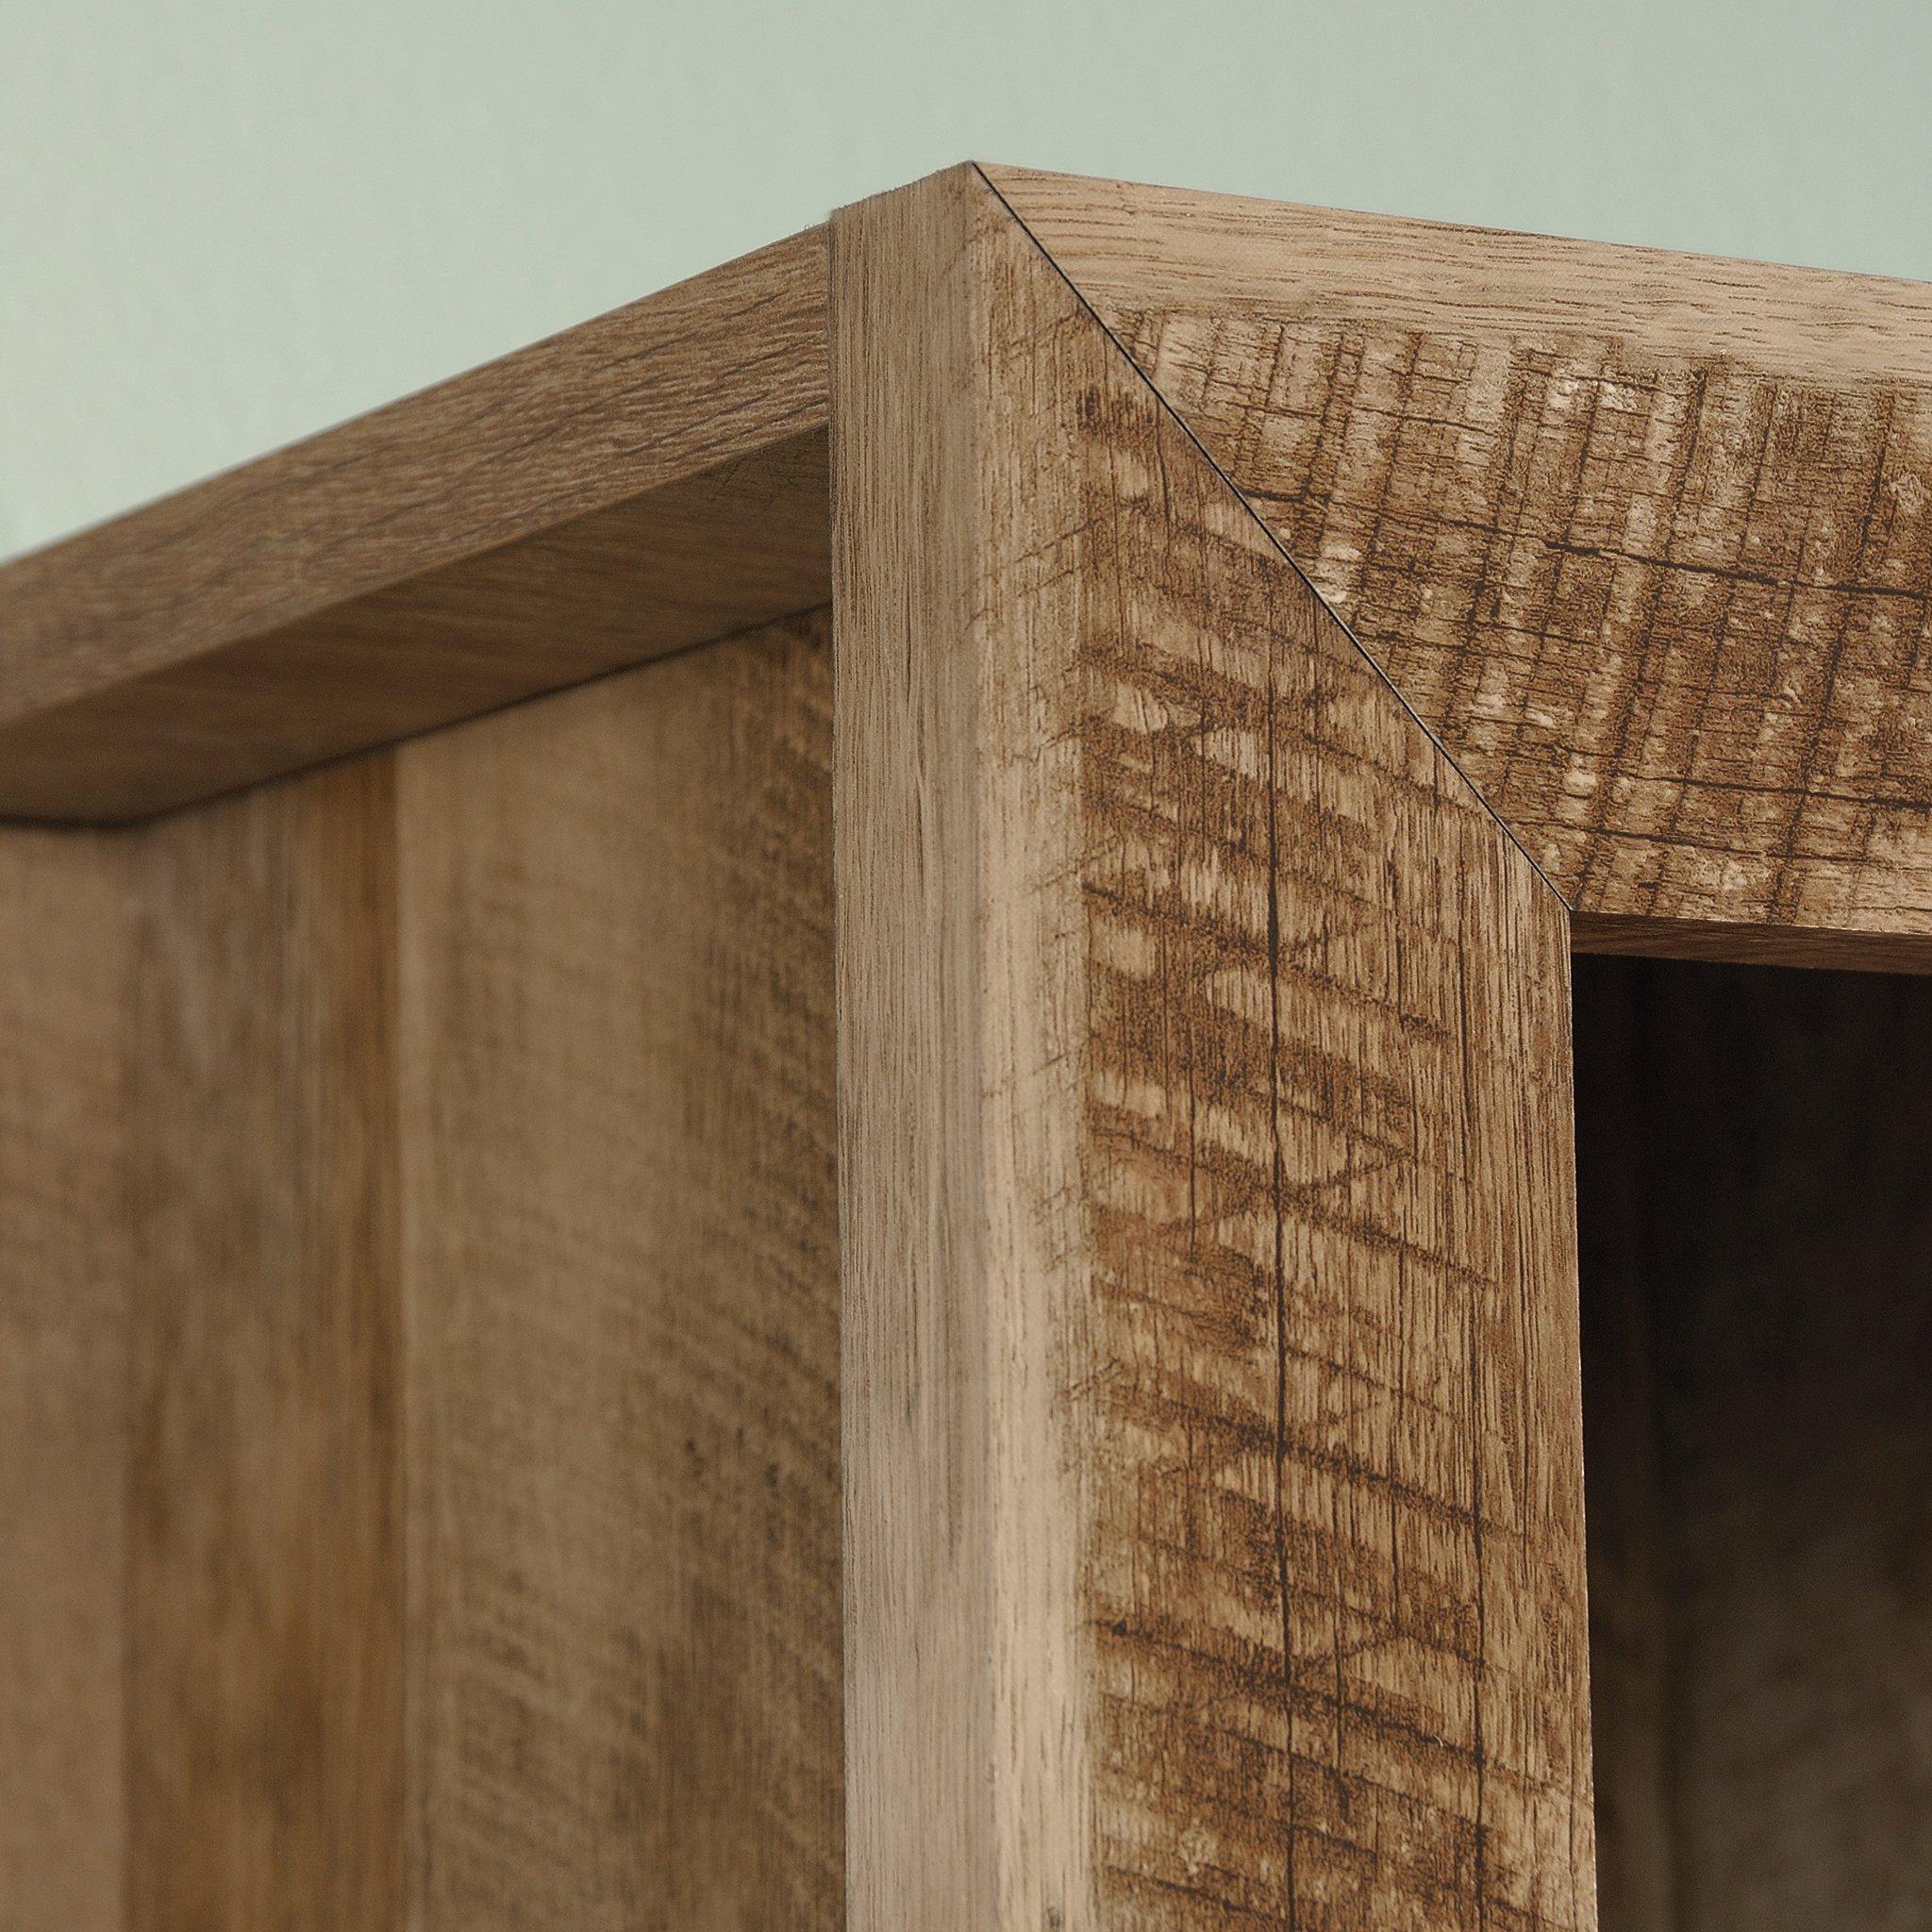 Sauder 420409 Dakota Pass Library with Doors, L: 33.82'' x W: 12.52'' x H: 71.10'', Craftsman Oak Finish by Sauder (Image #5)